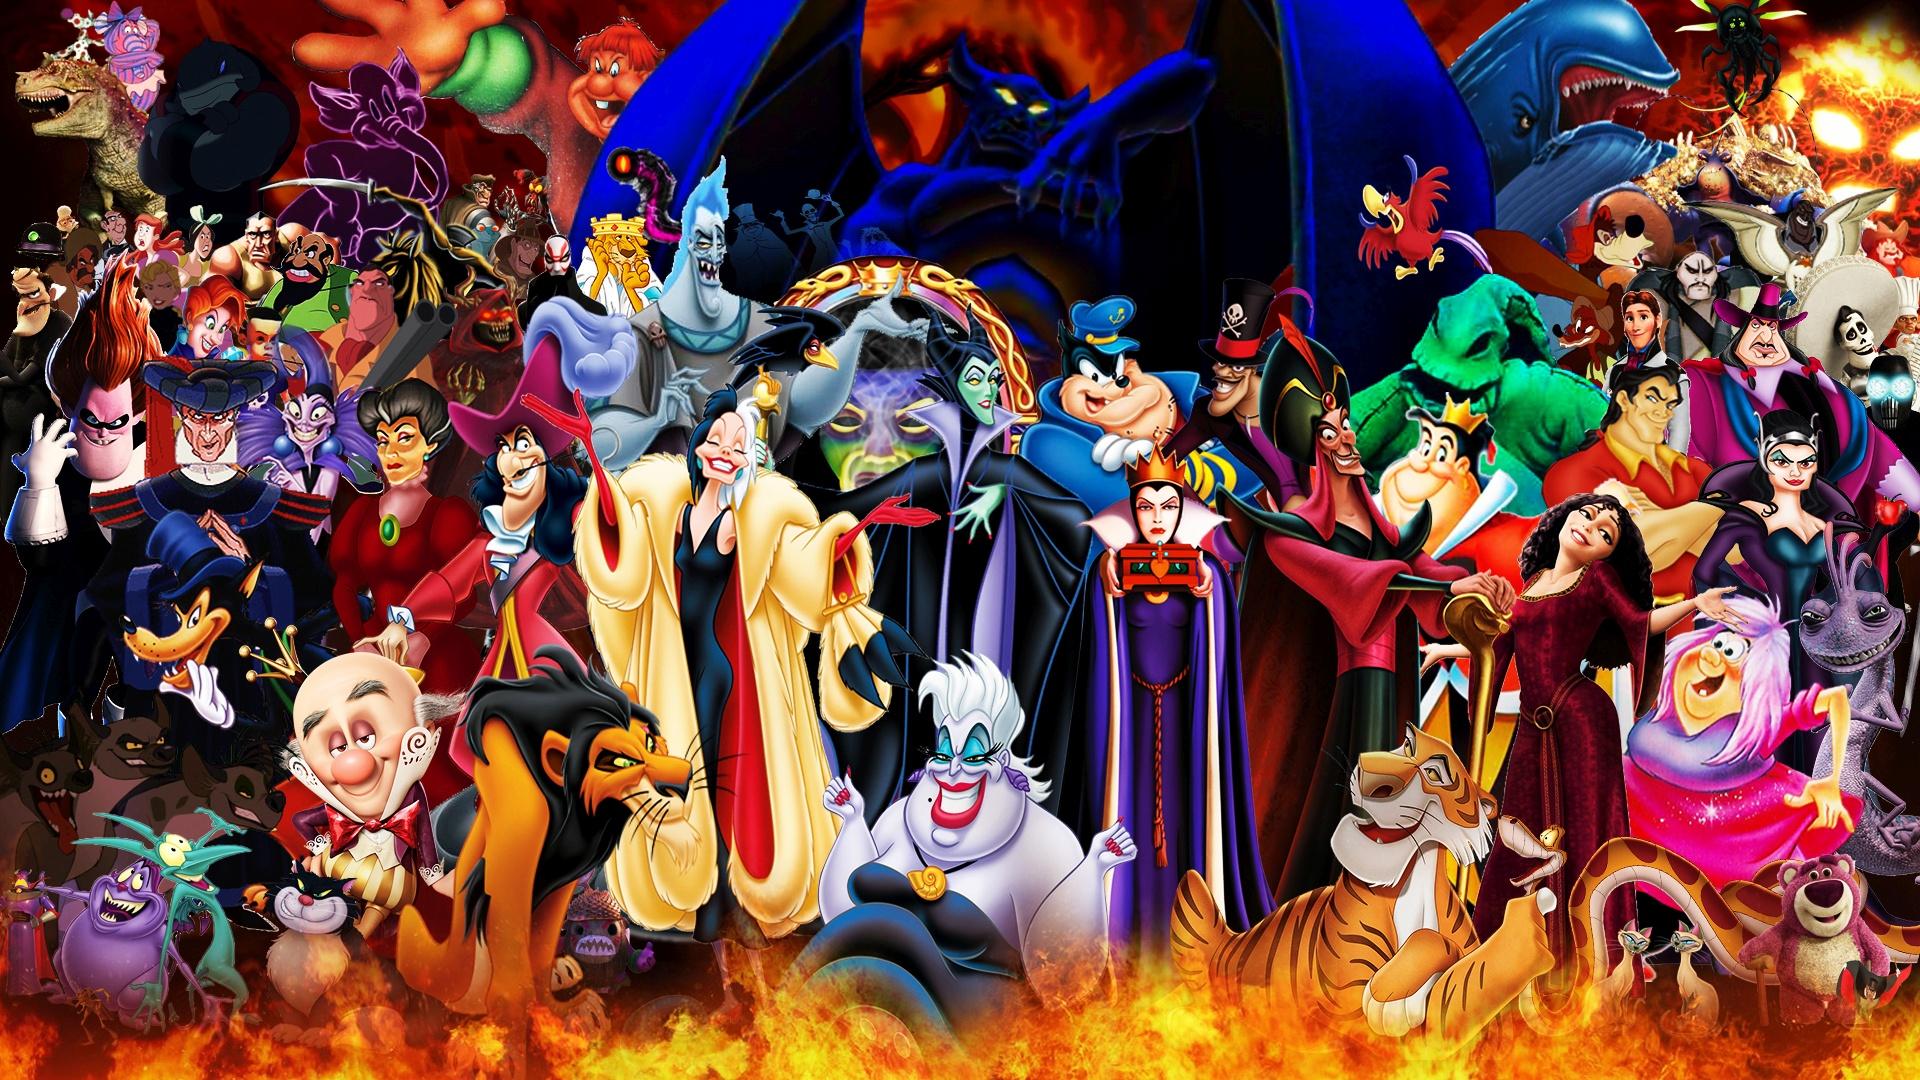 Disney computer wallpaper